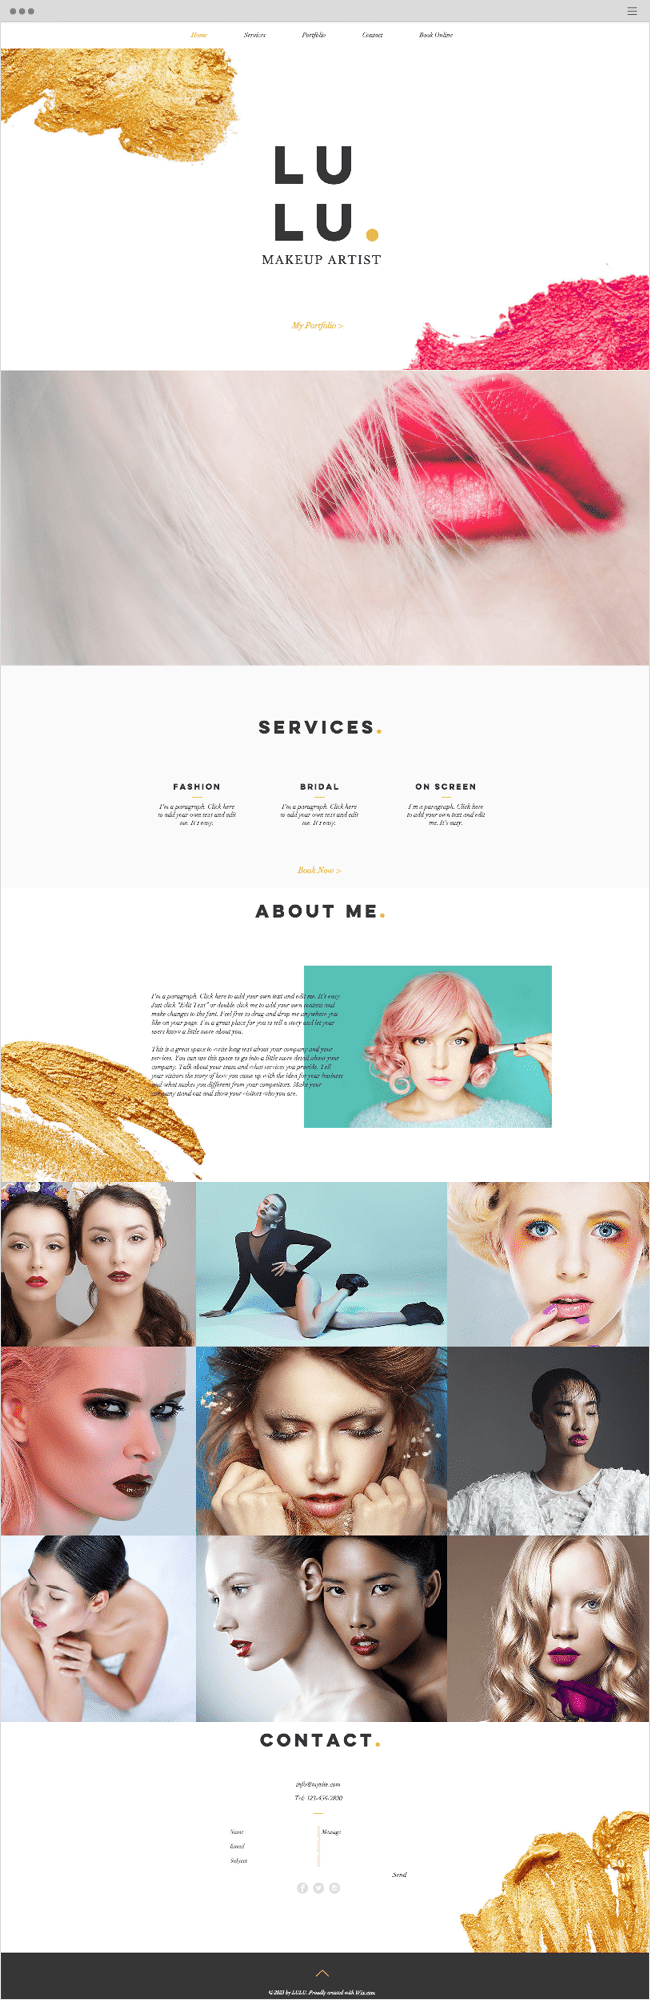 Professional Makeup Wix Website Template